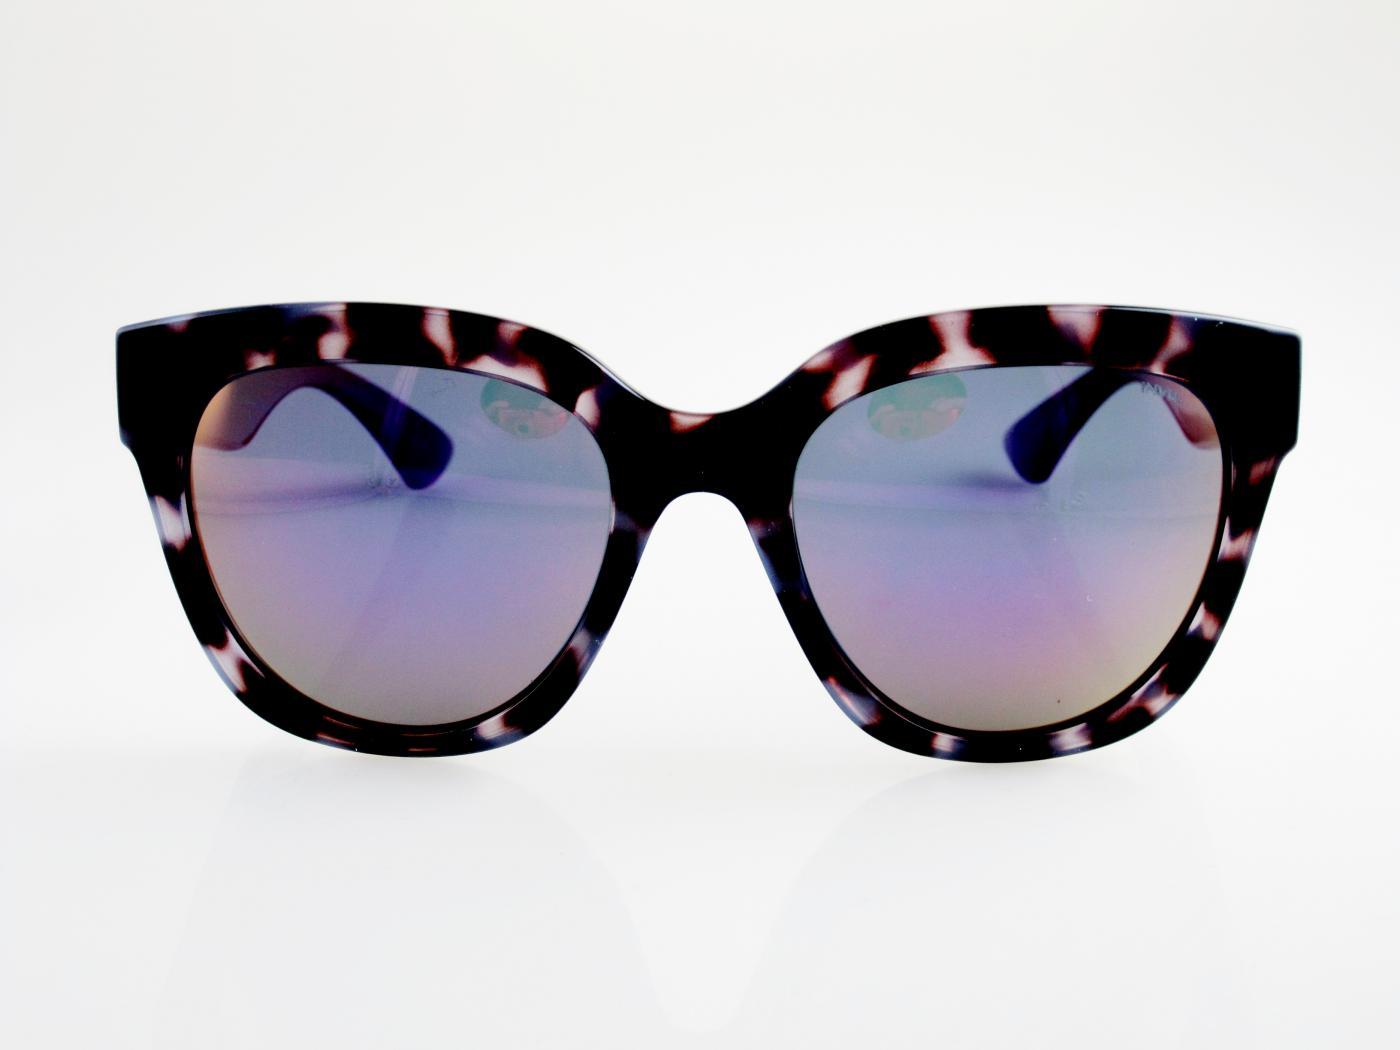 e51a0b2ea Dámske slnečné okuliare INVU - Trend Collection | oftalens.sk